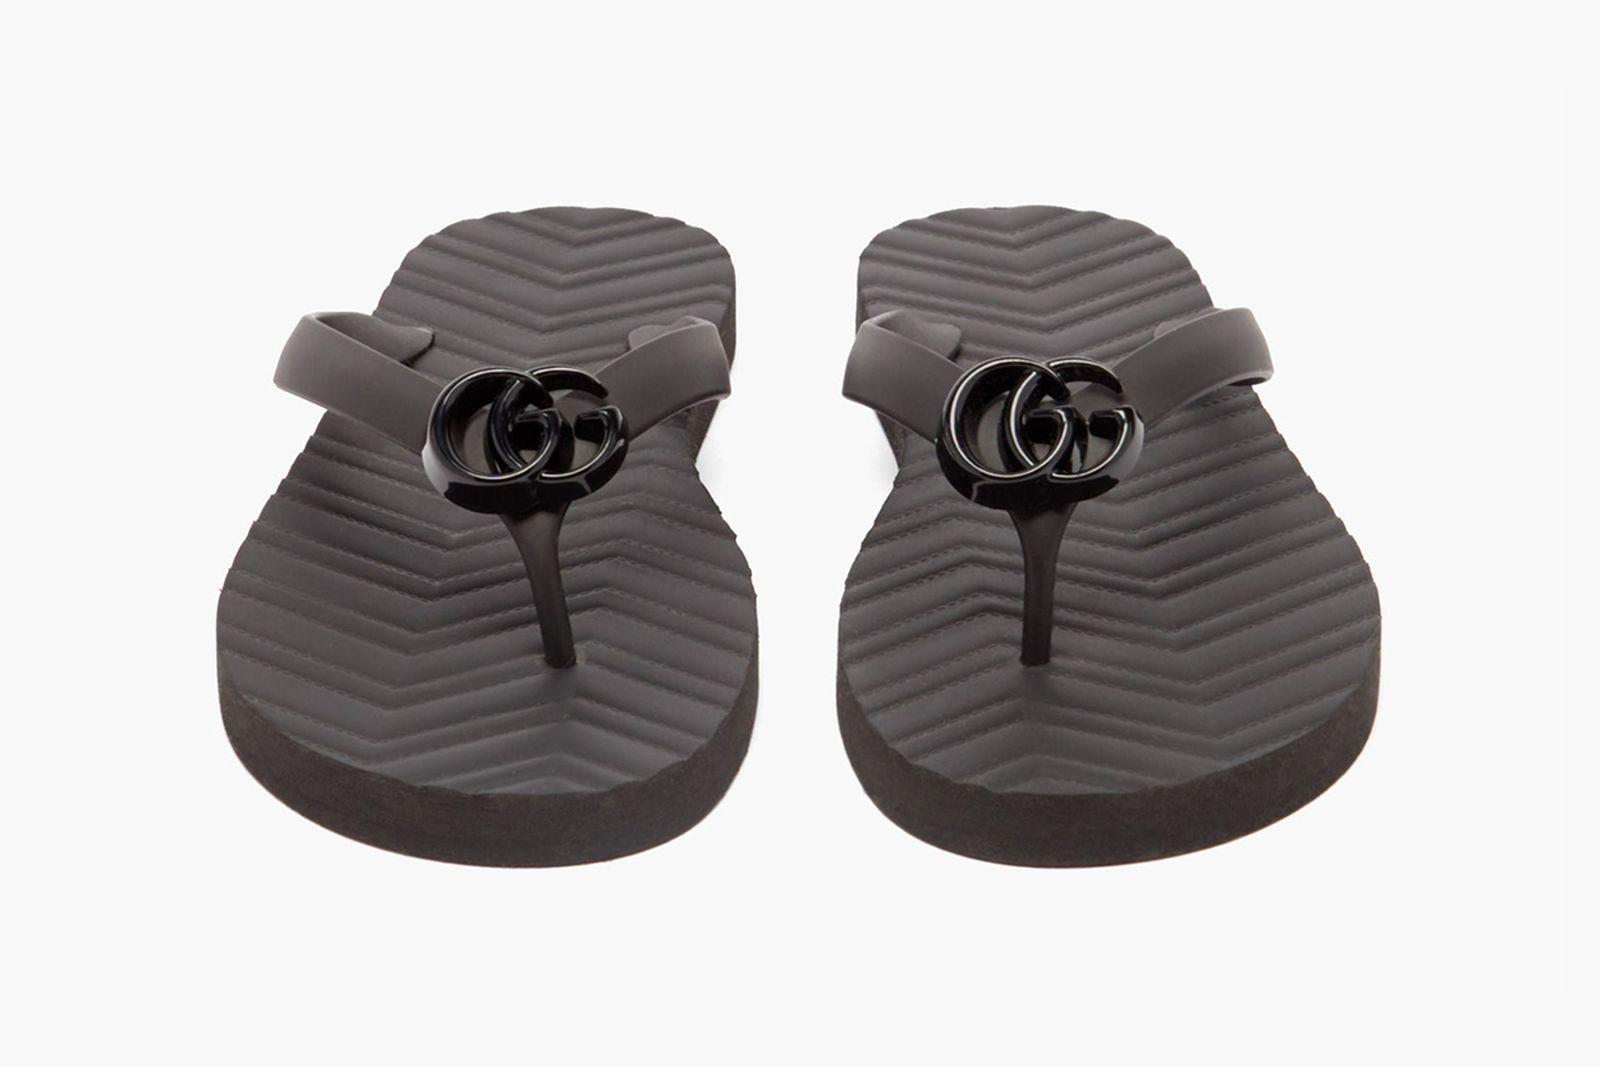 gucci flip flop sandals (1)